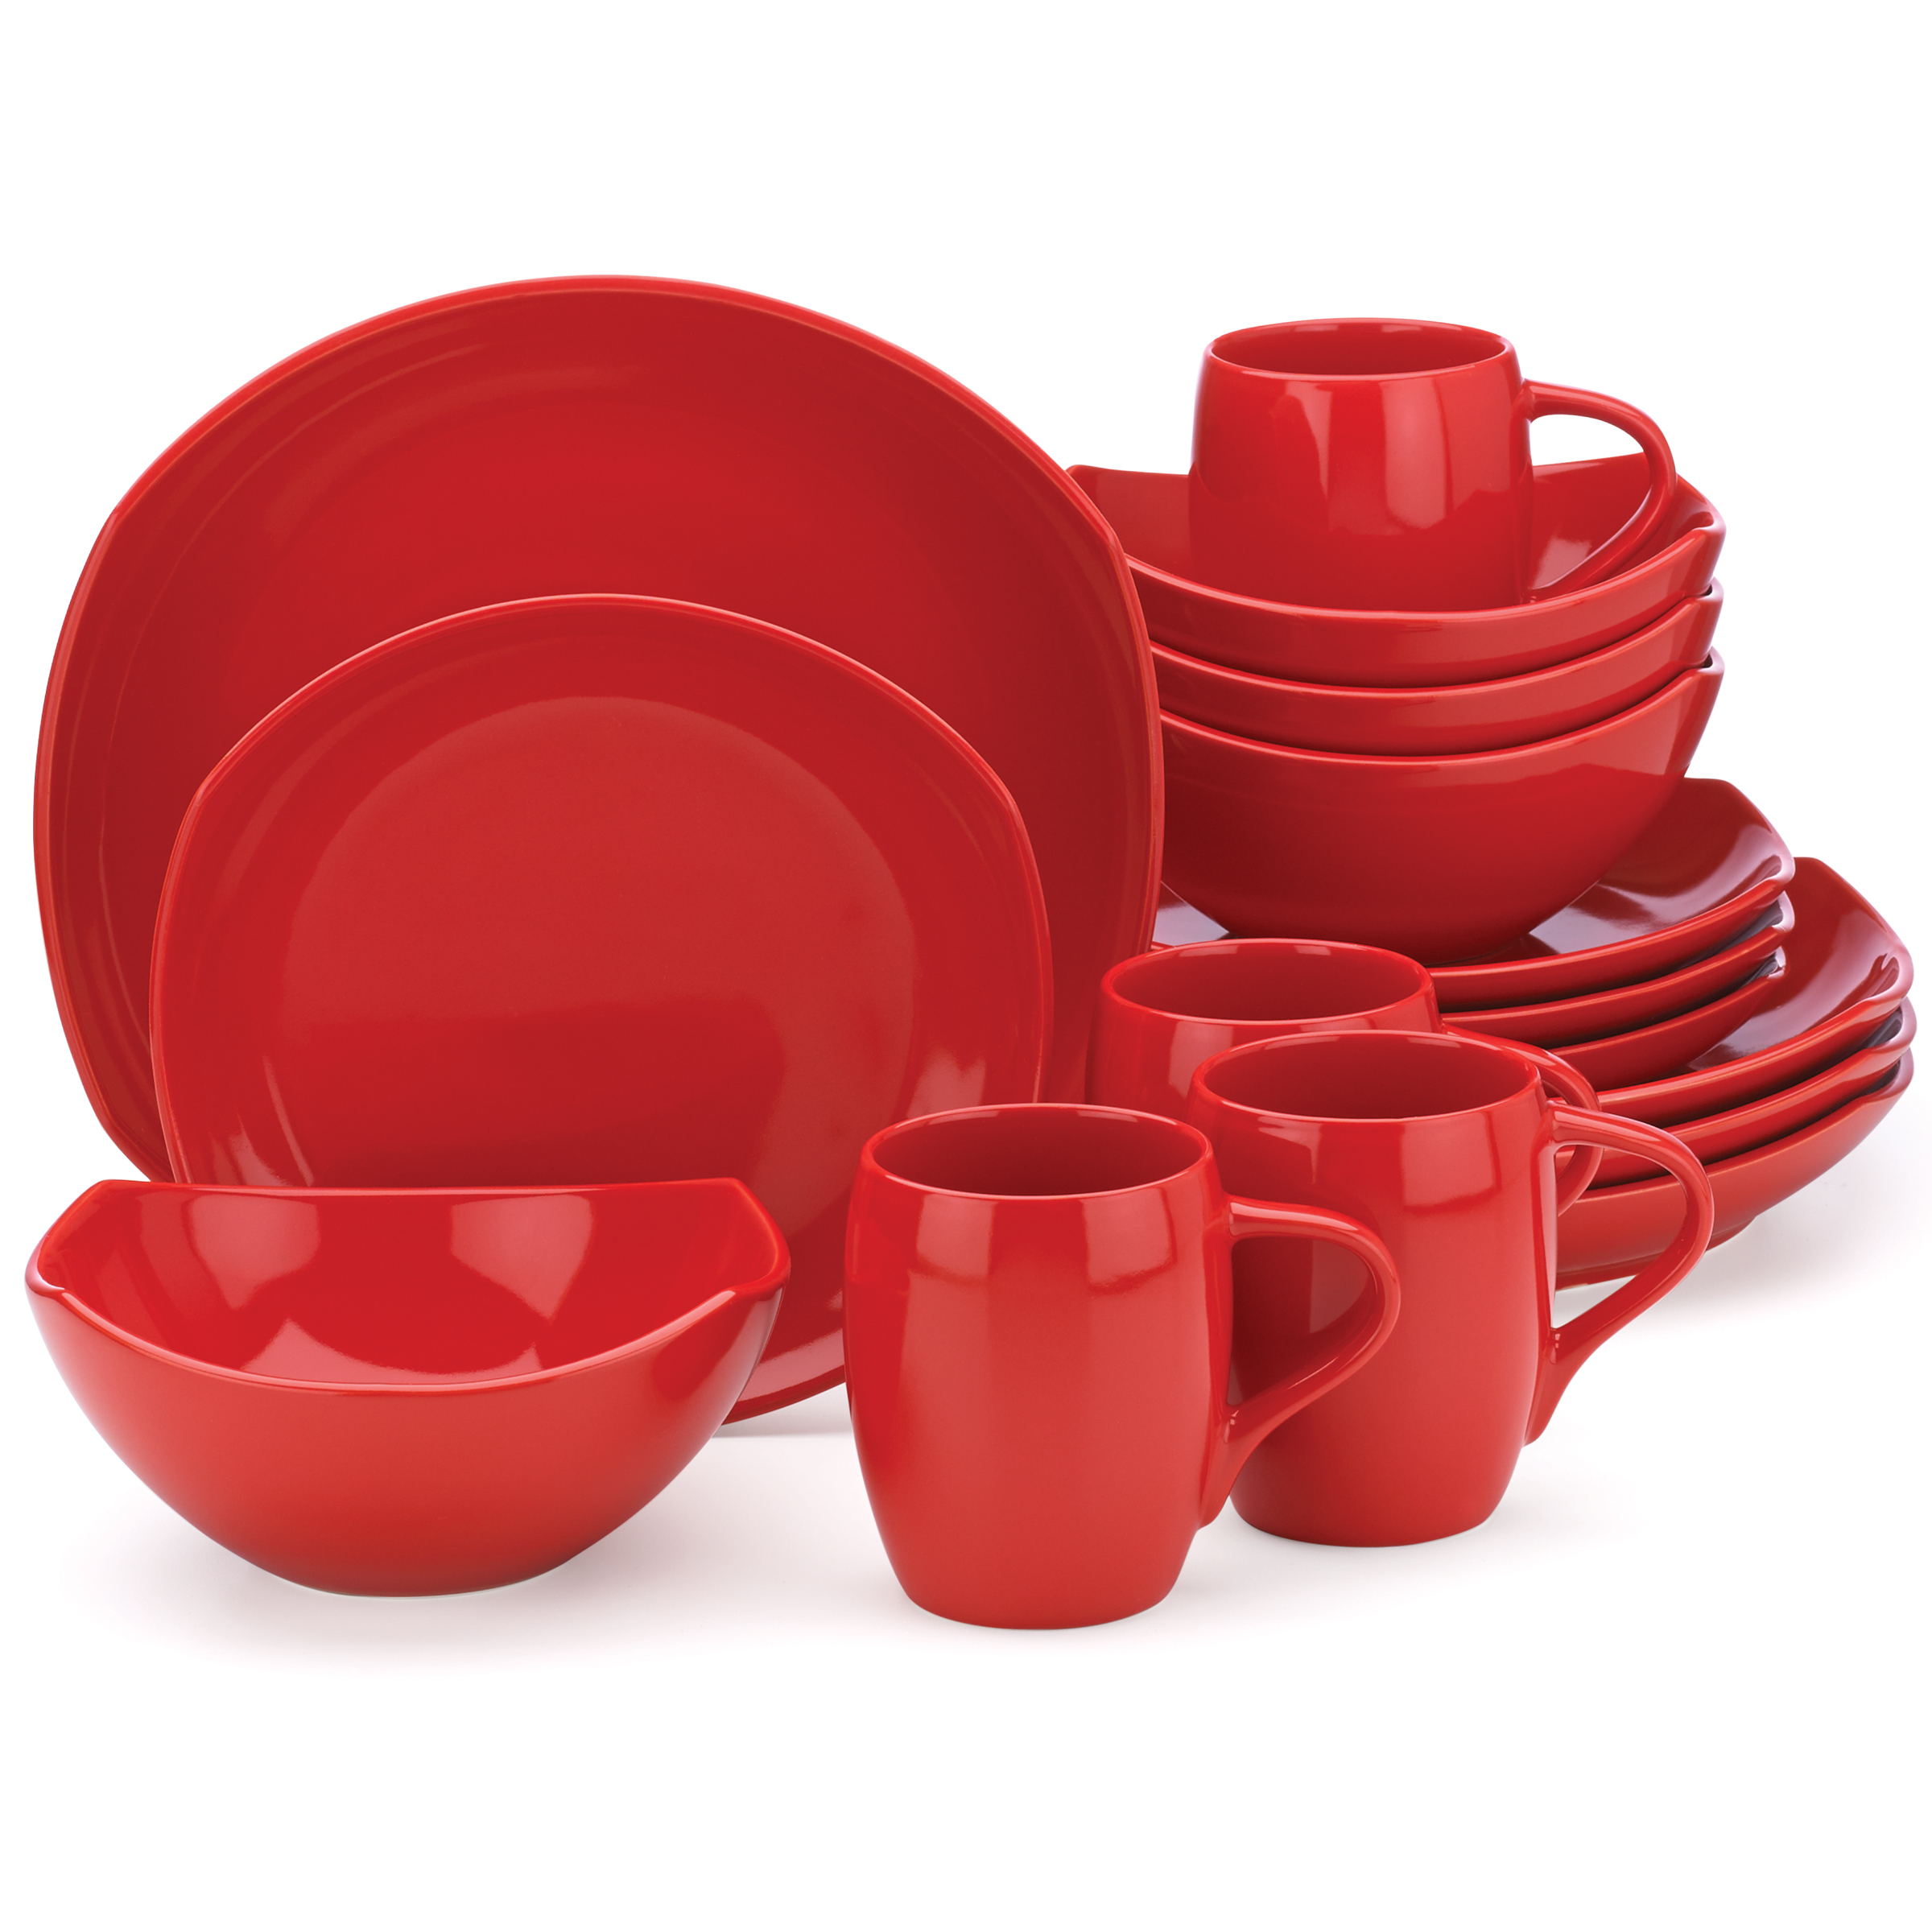 Dansk Classic Fjord Chili Red 16 Piece Dinnerware Set